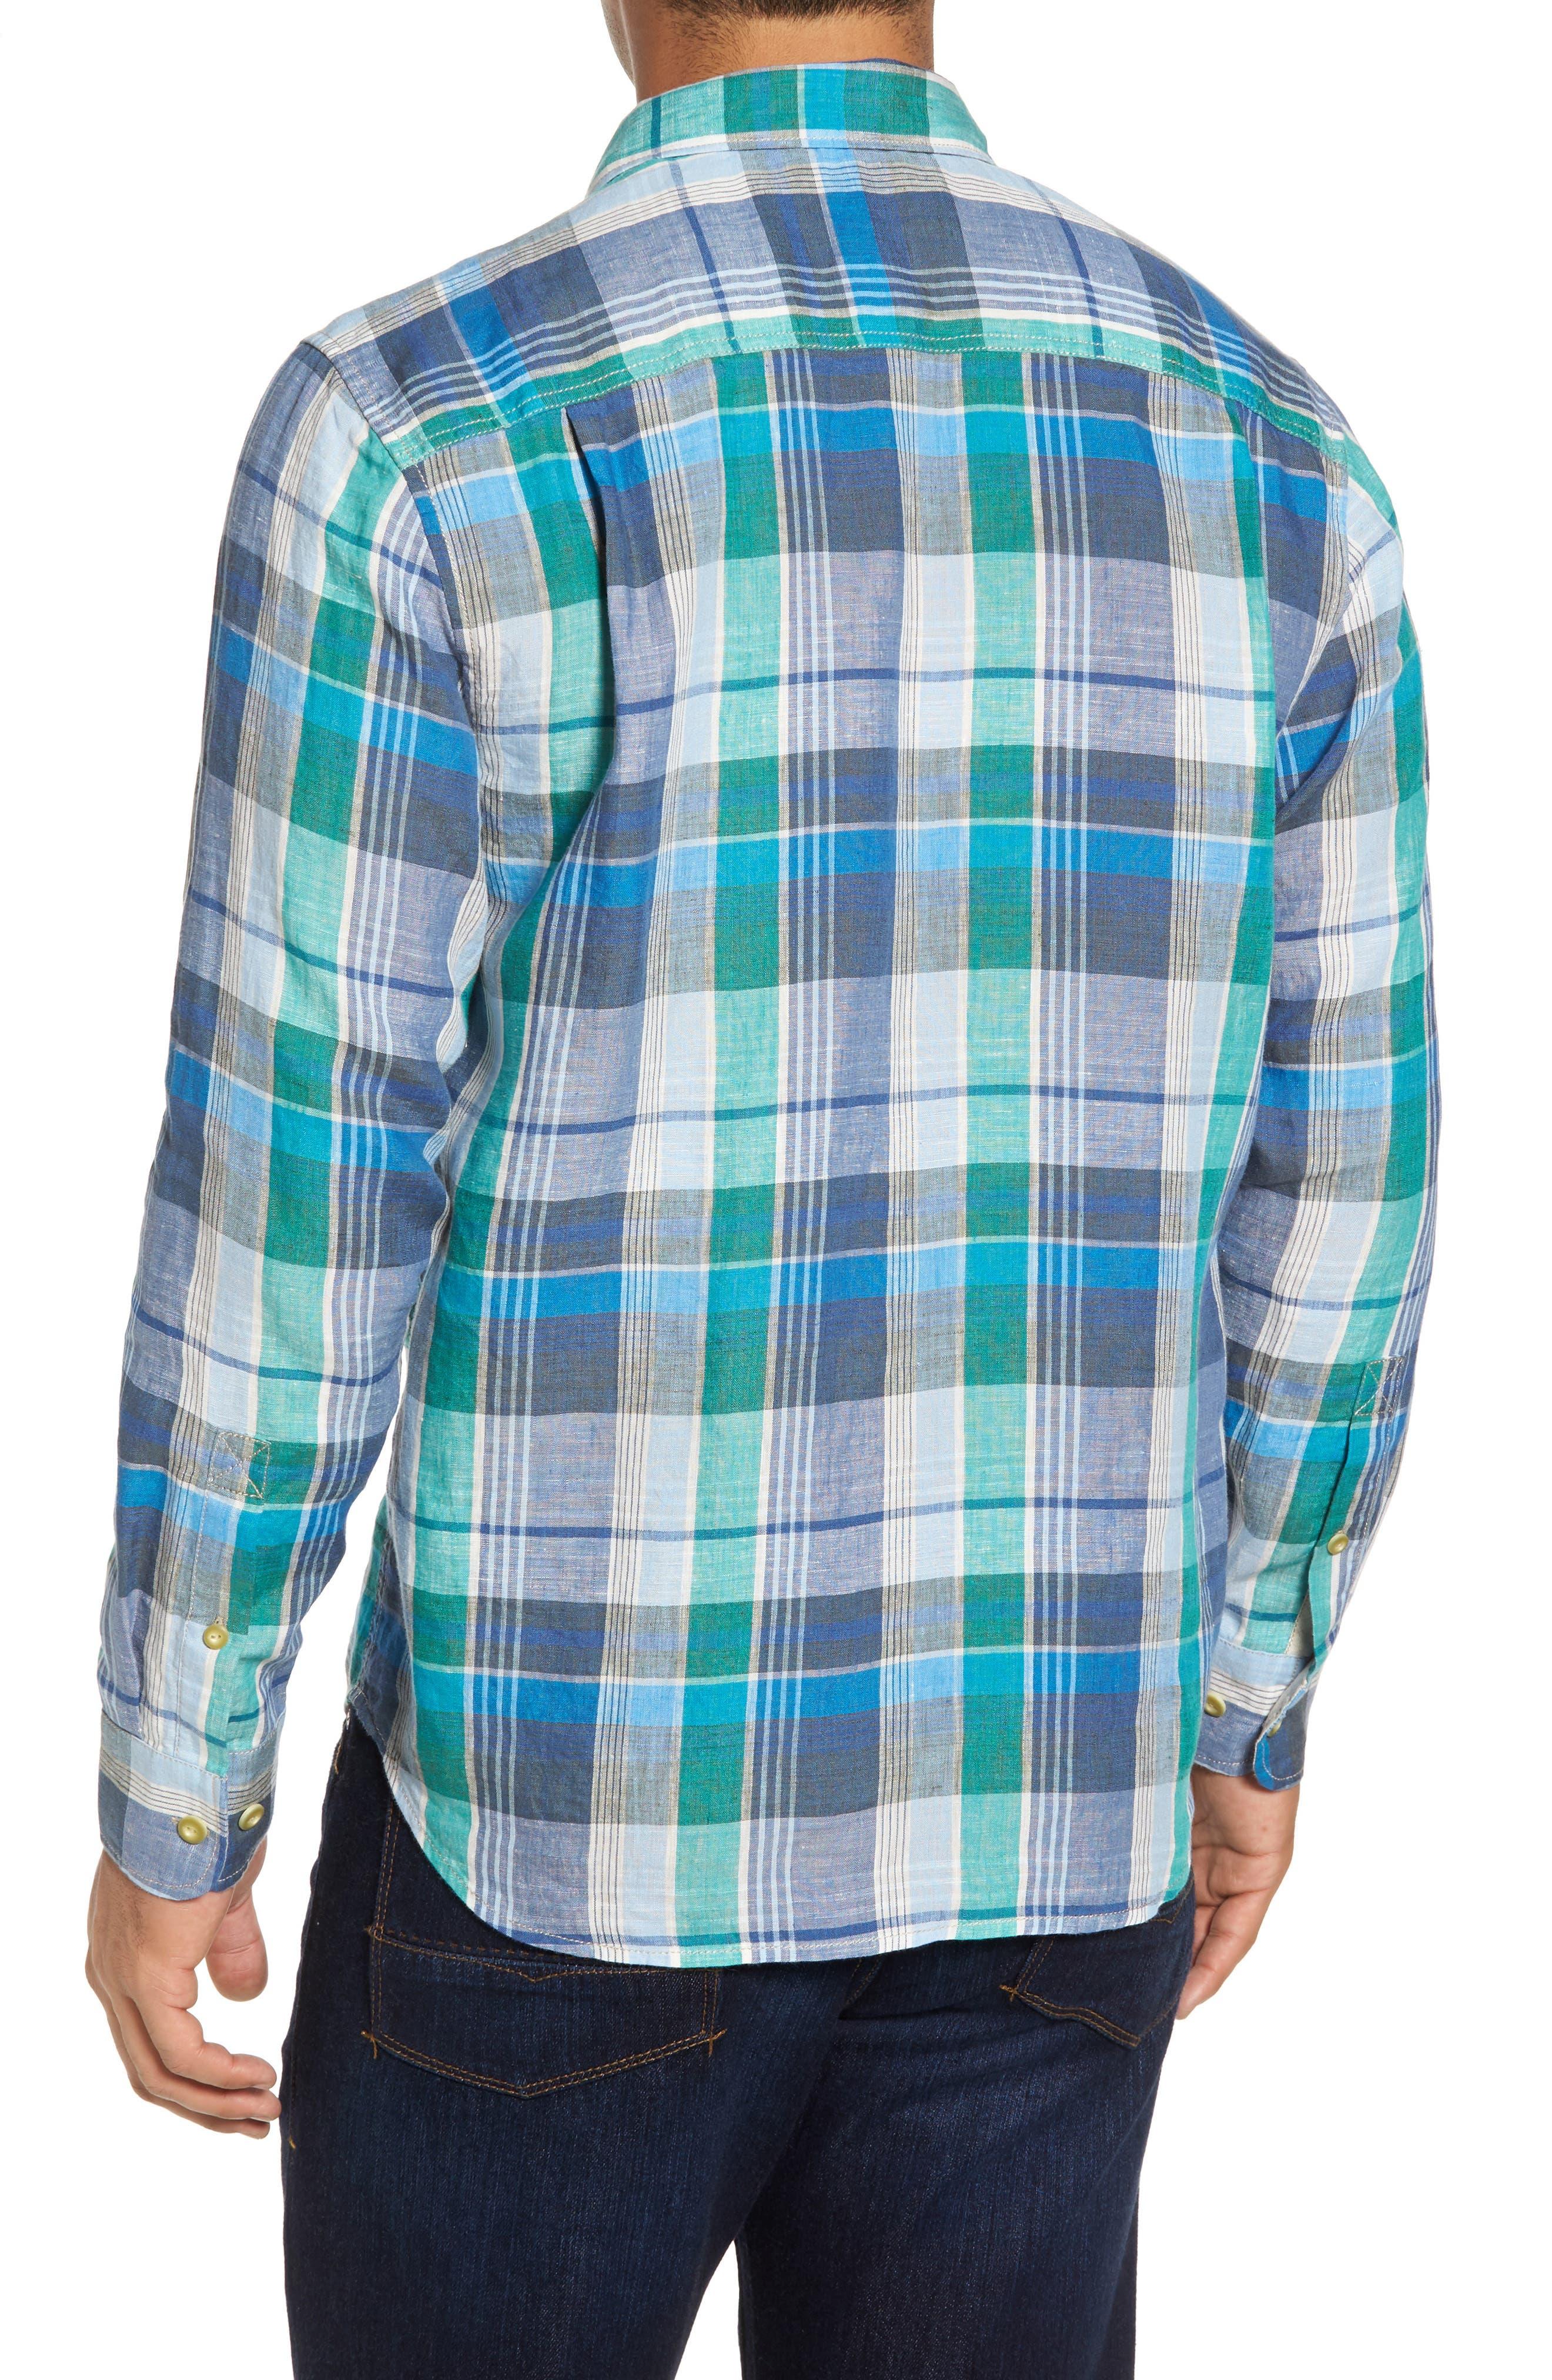 TOMMY BAHAMA,                             Vero Beach Madras Plaid Linen Sport Shirt,                             Alternate thumbnail 2, color,                             300